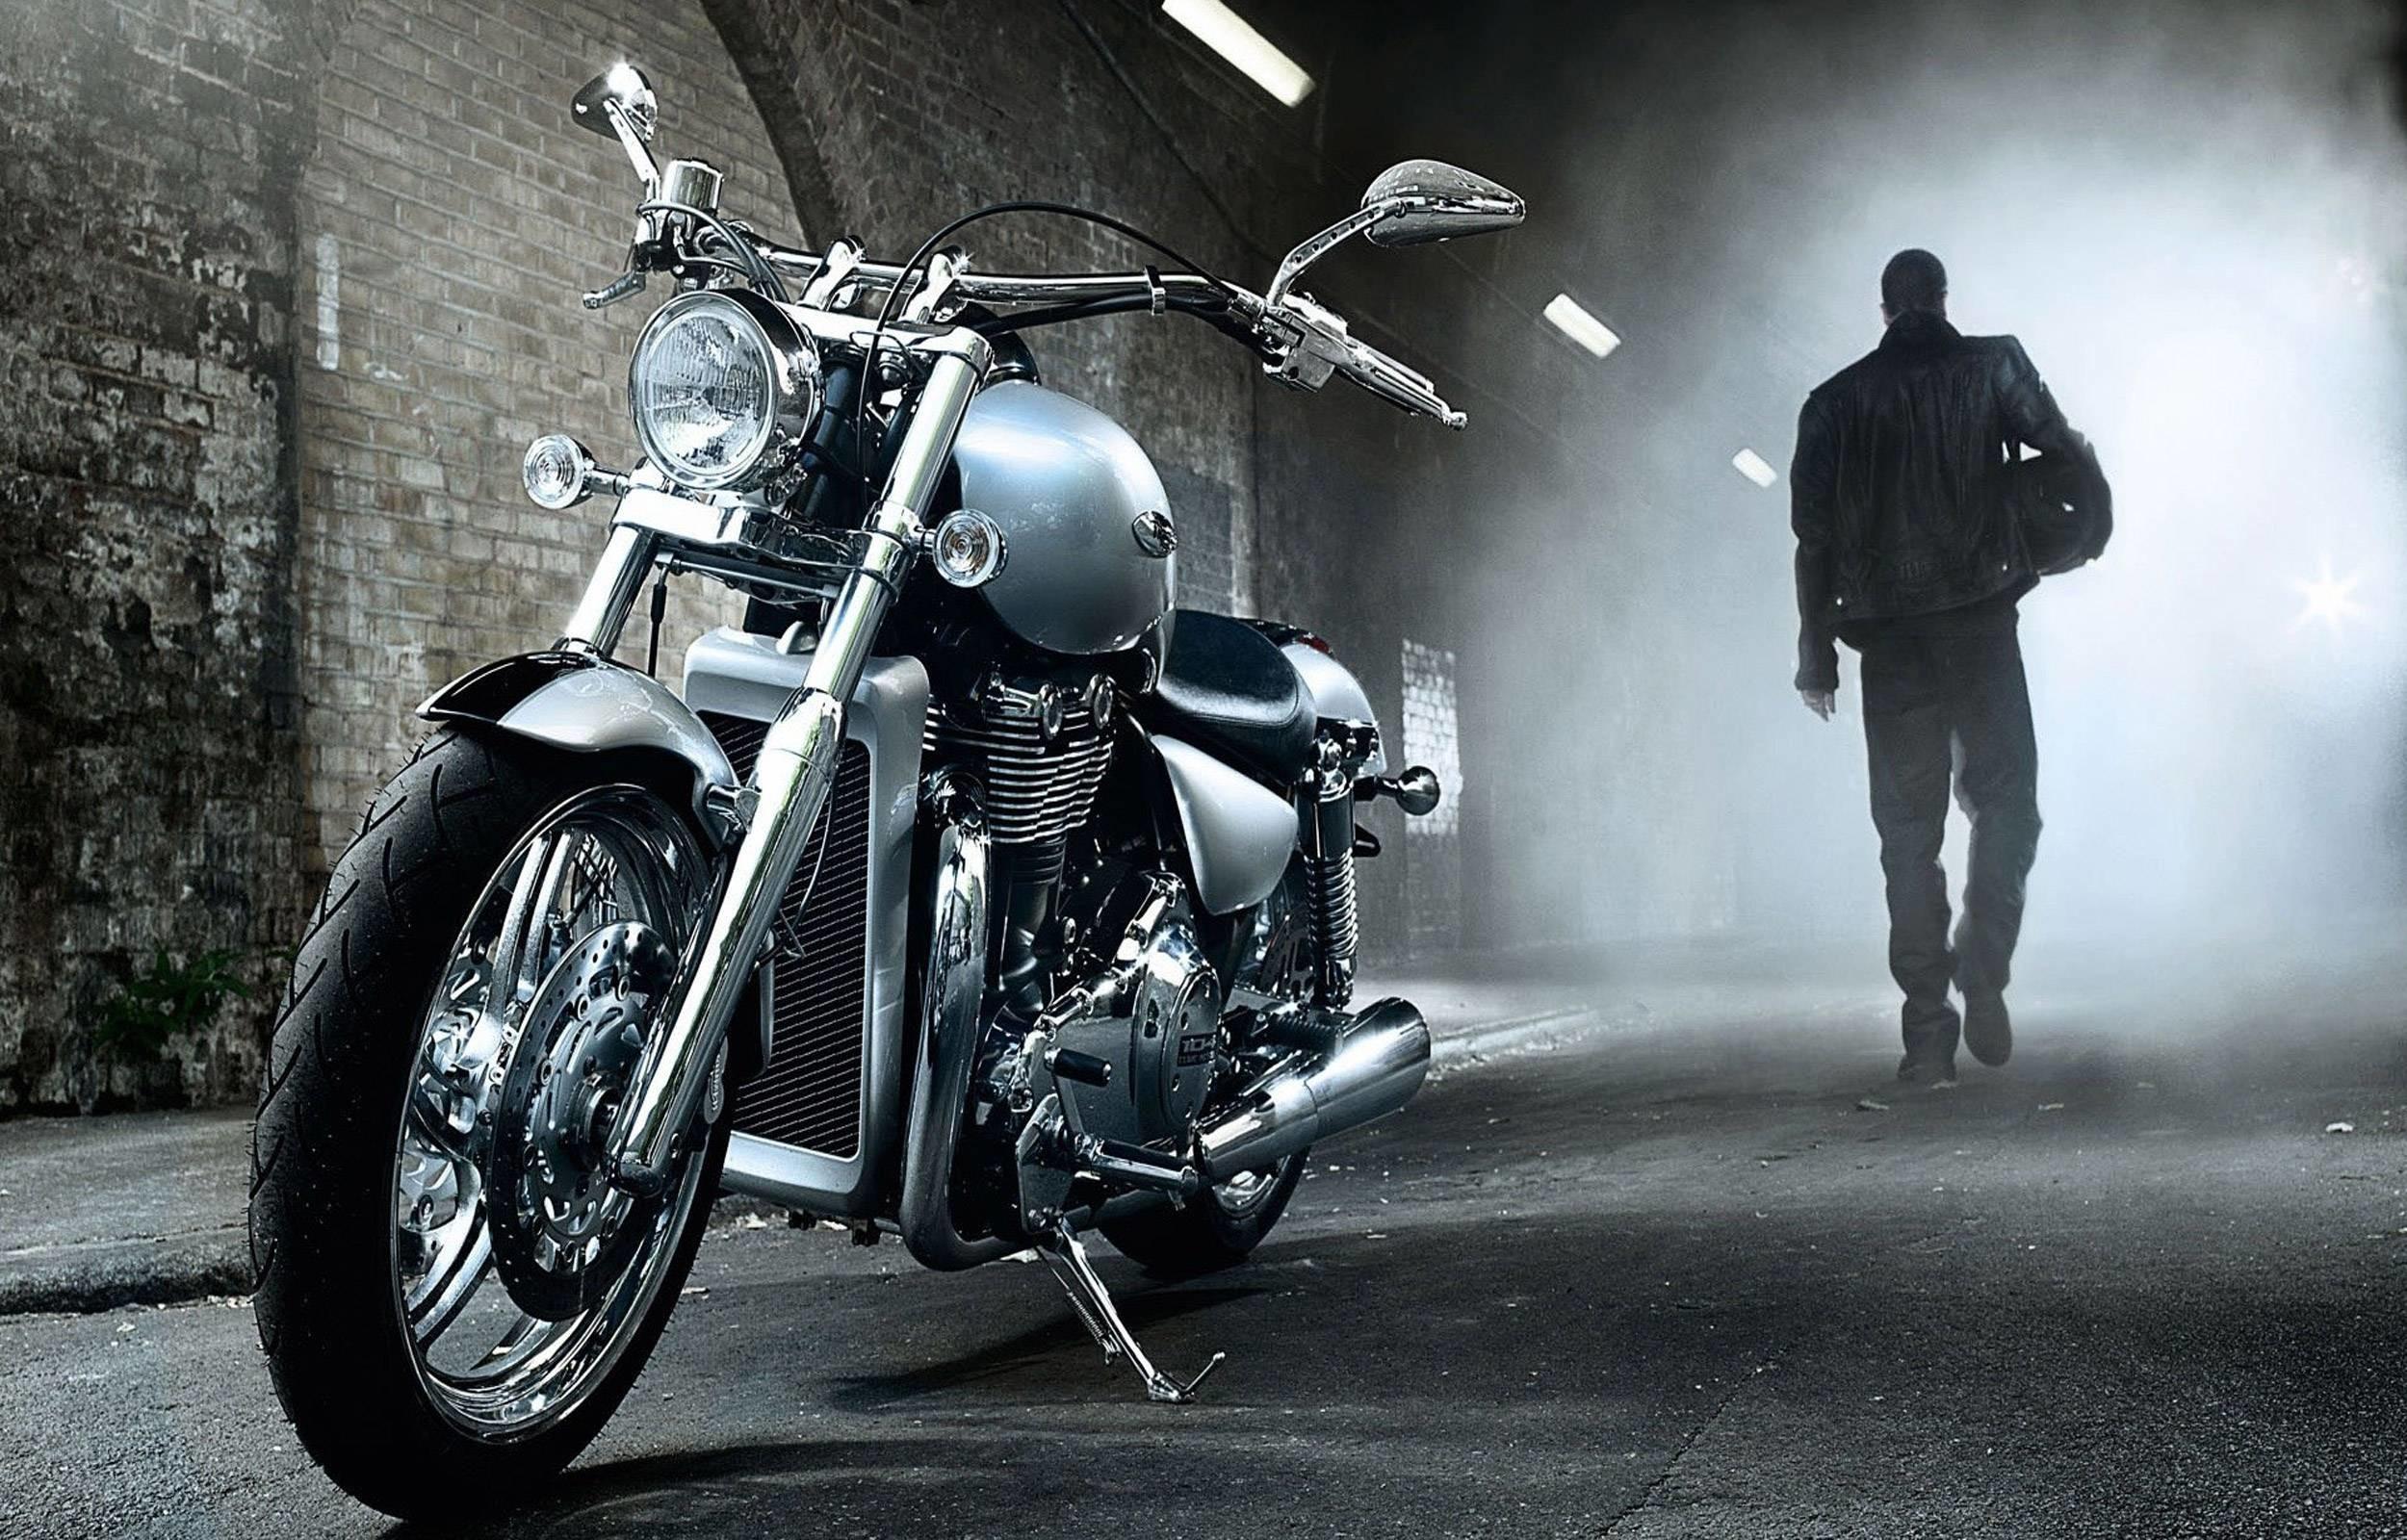 Harley Davidson Wallpapers and